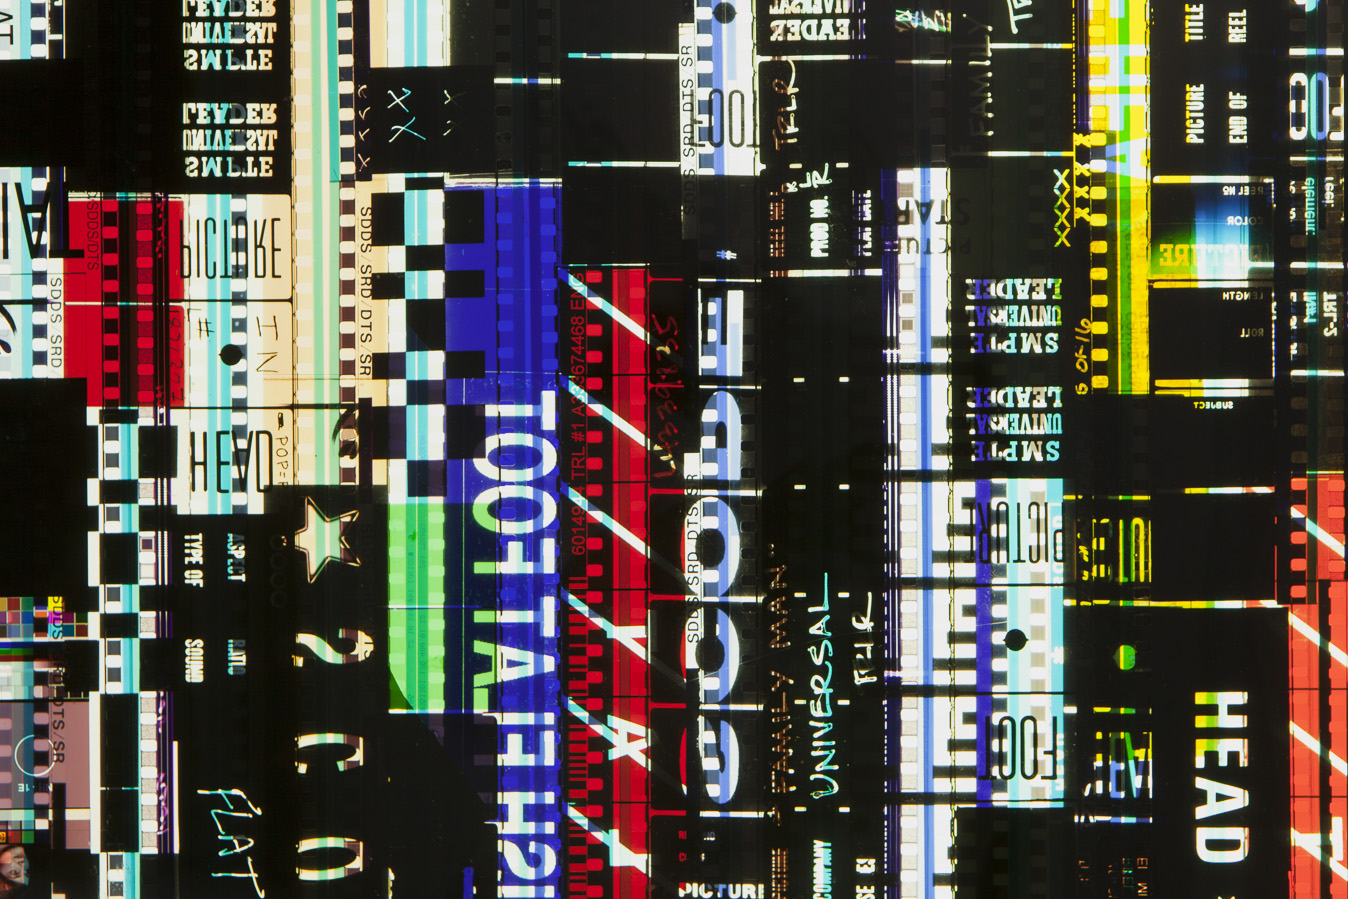 Ascending Leaders 1.35mm Celluloid Film, Fluorescent Lights, Custom Lightbox. 30x30x6. Richard Kerr. 2016. (Detail).